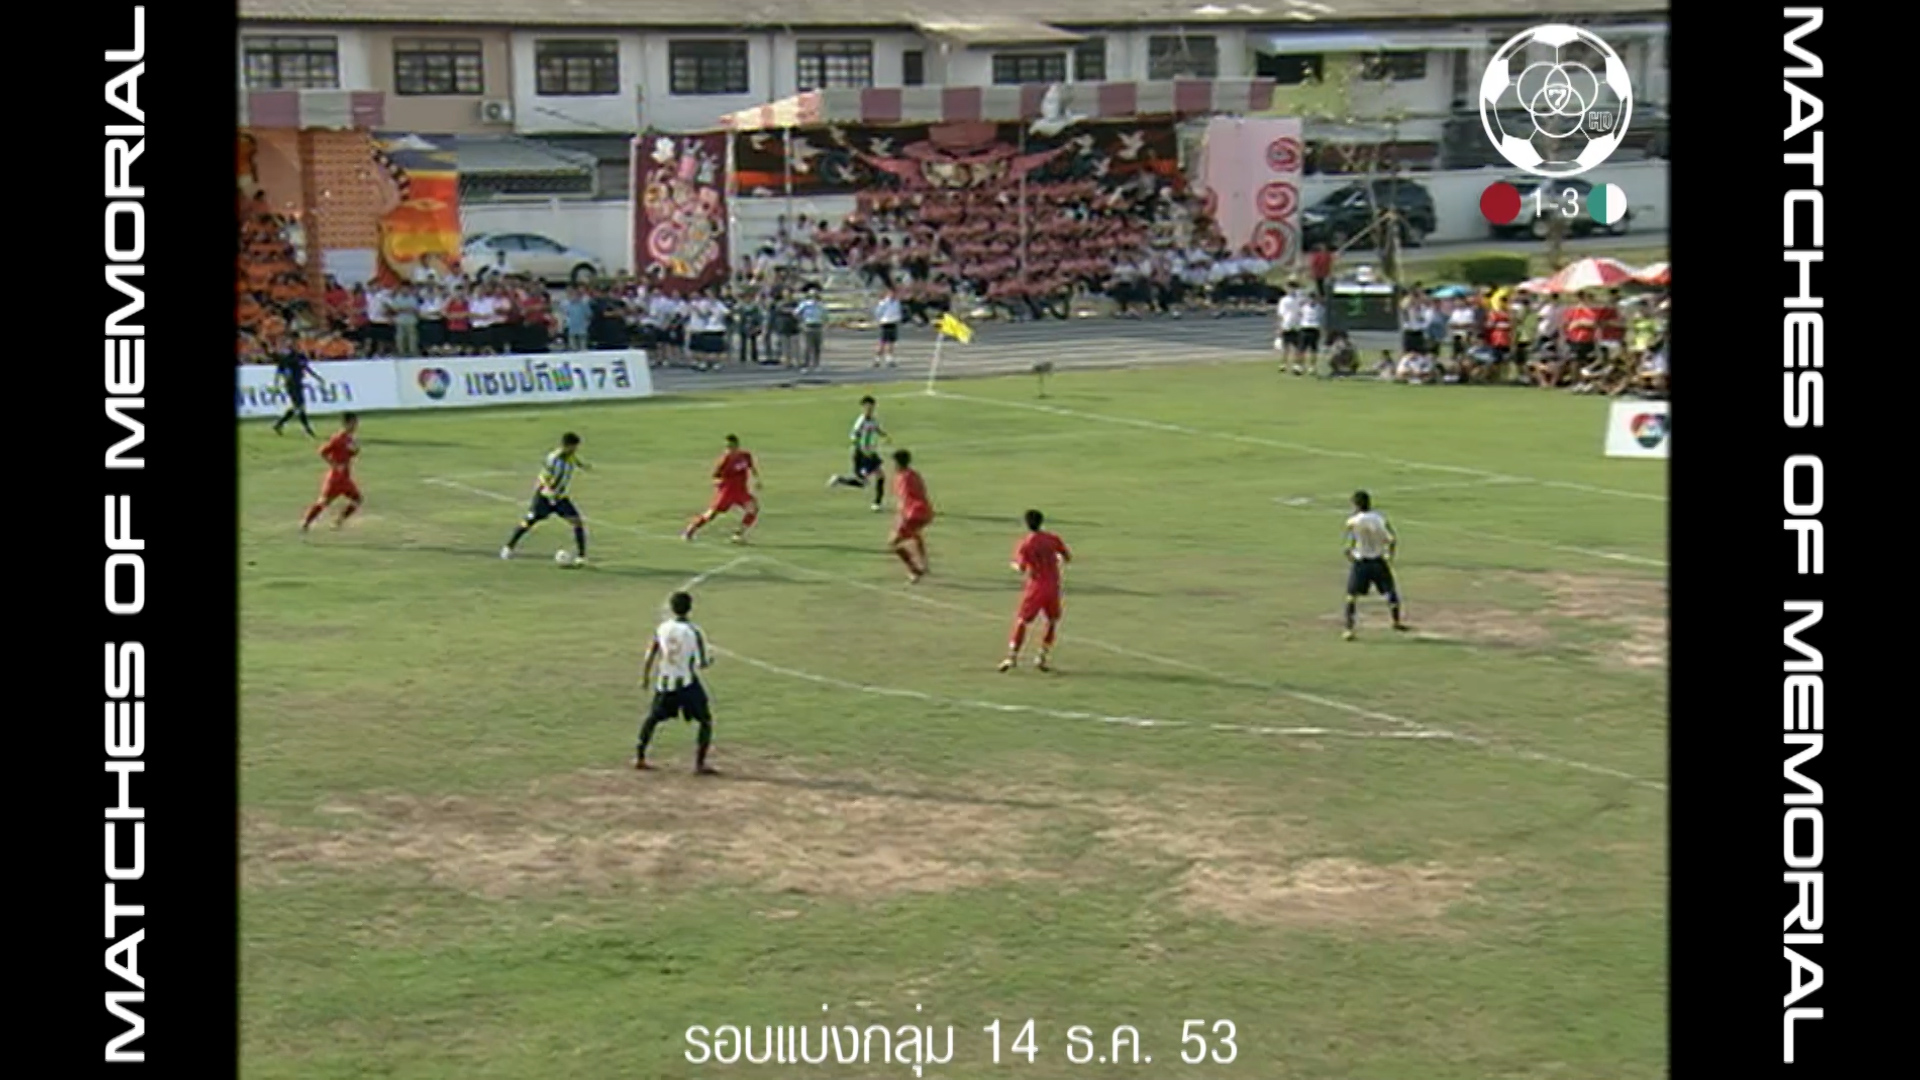 Matches of Memorial : EP.45 แมตช์แห่งความทรงจำ ฟุตบอลนักเรียน 7 คน ที่สนุกที่สุด